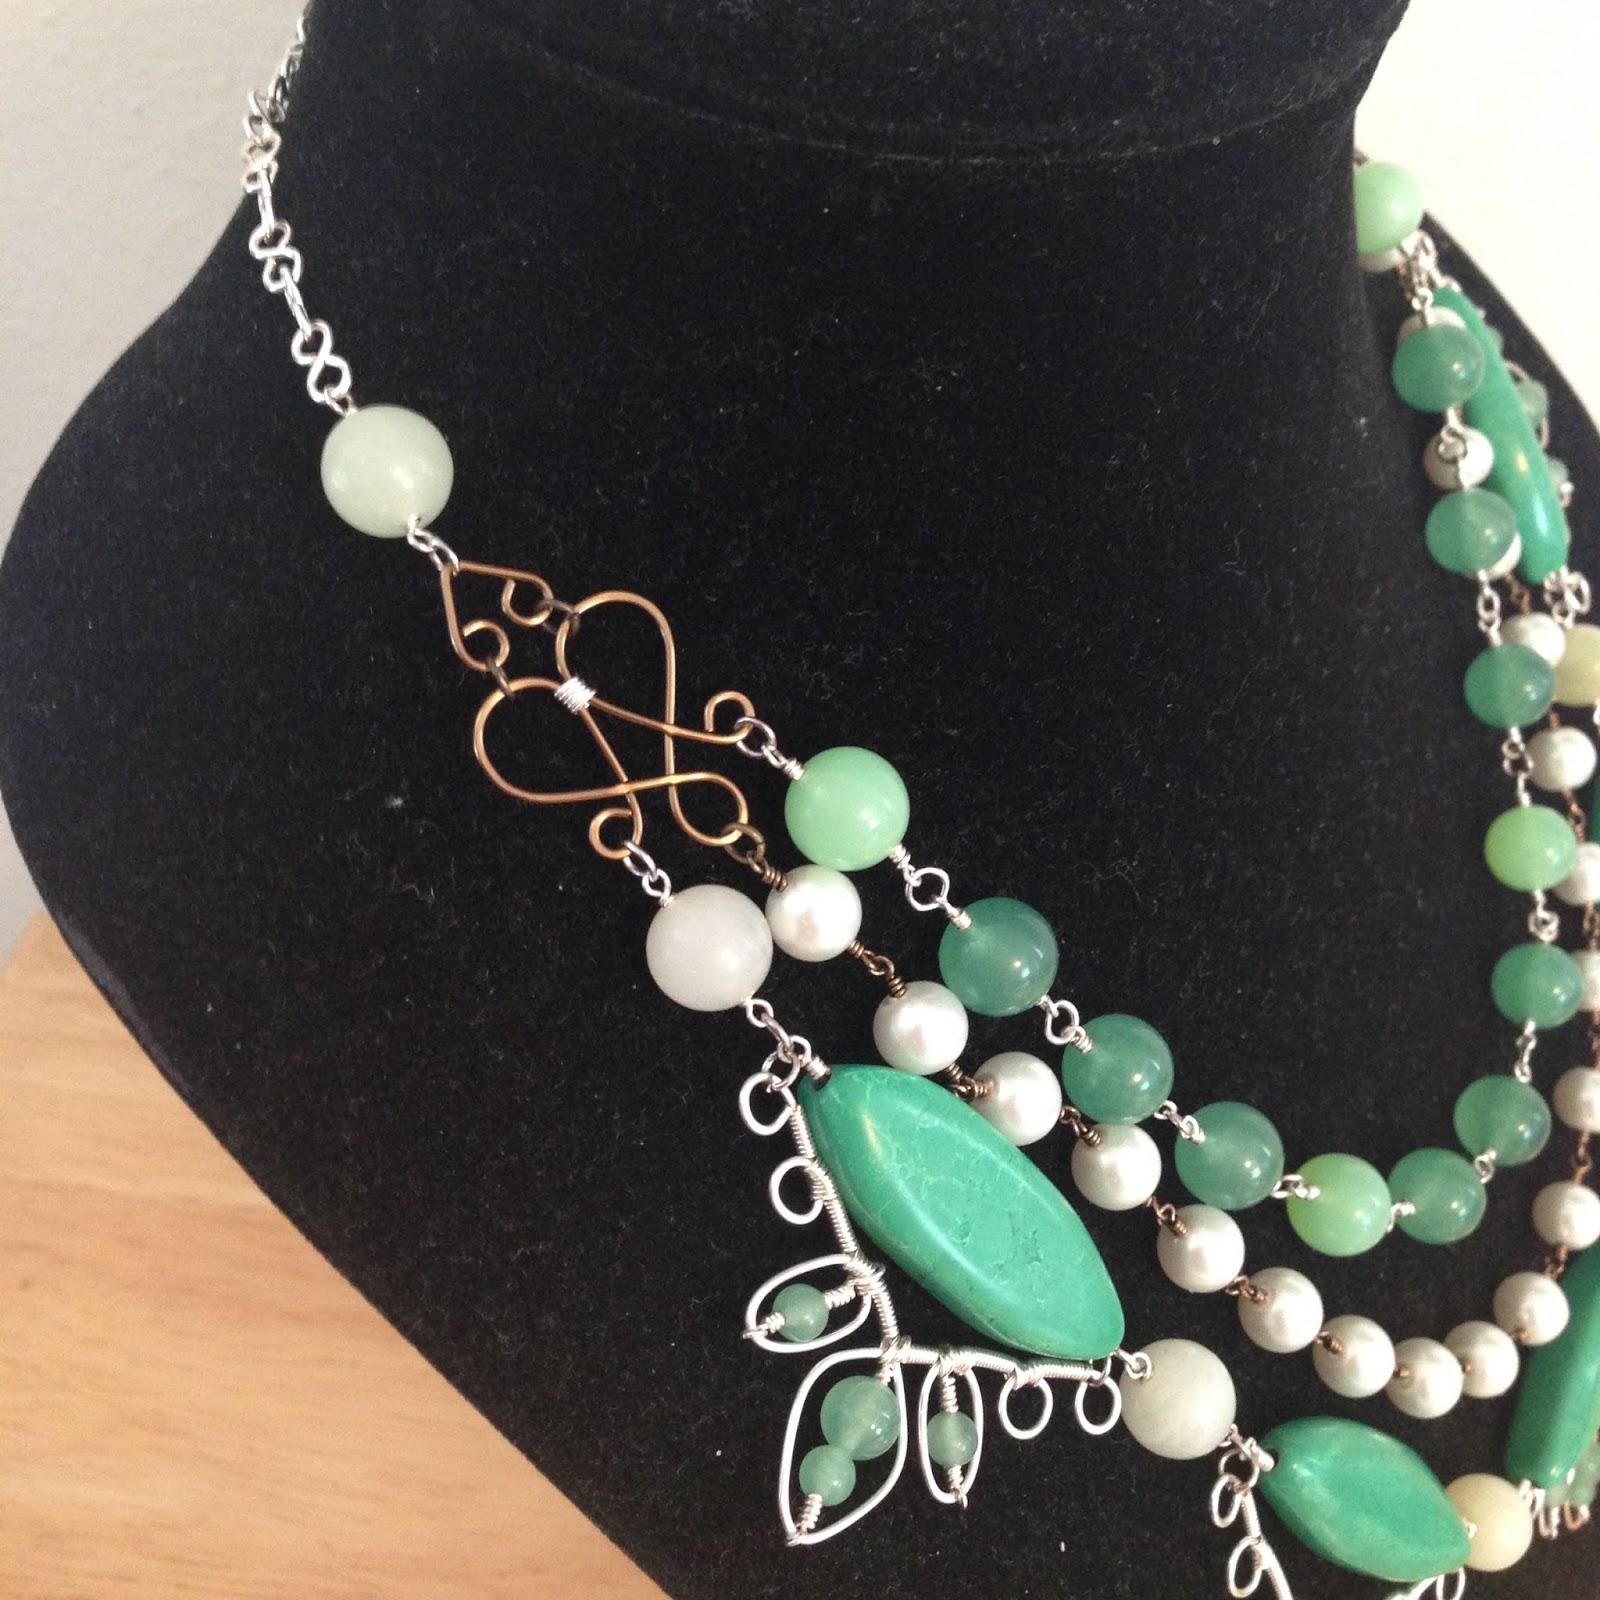 Everyday Bijoux: \'Green Goddess\' Wire Wrapped Statement Necklace